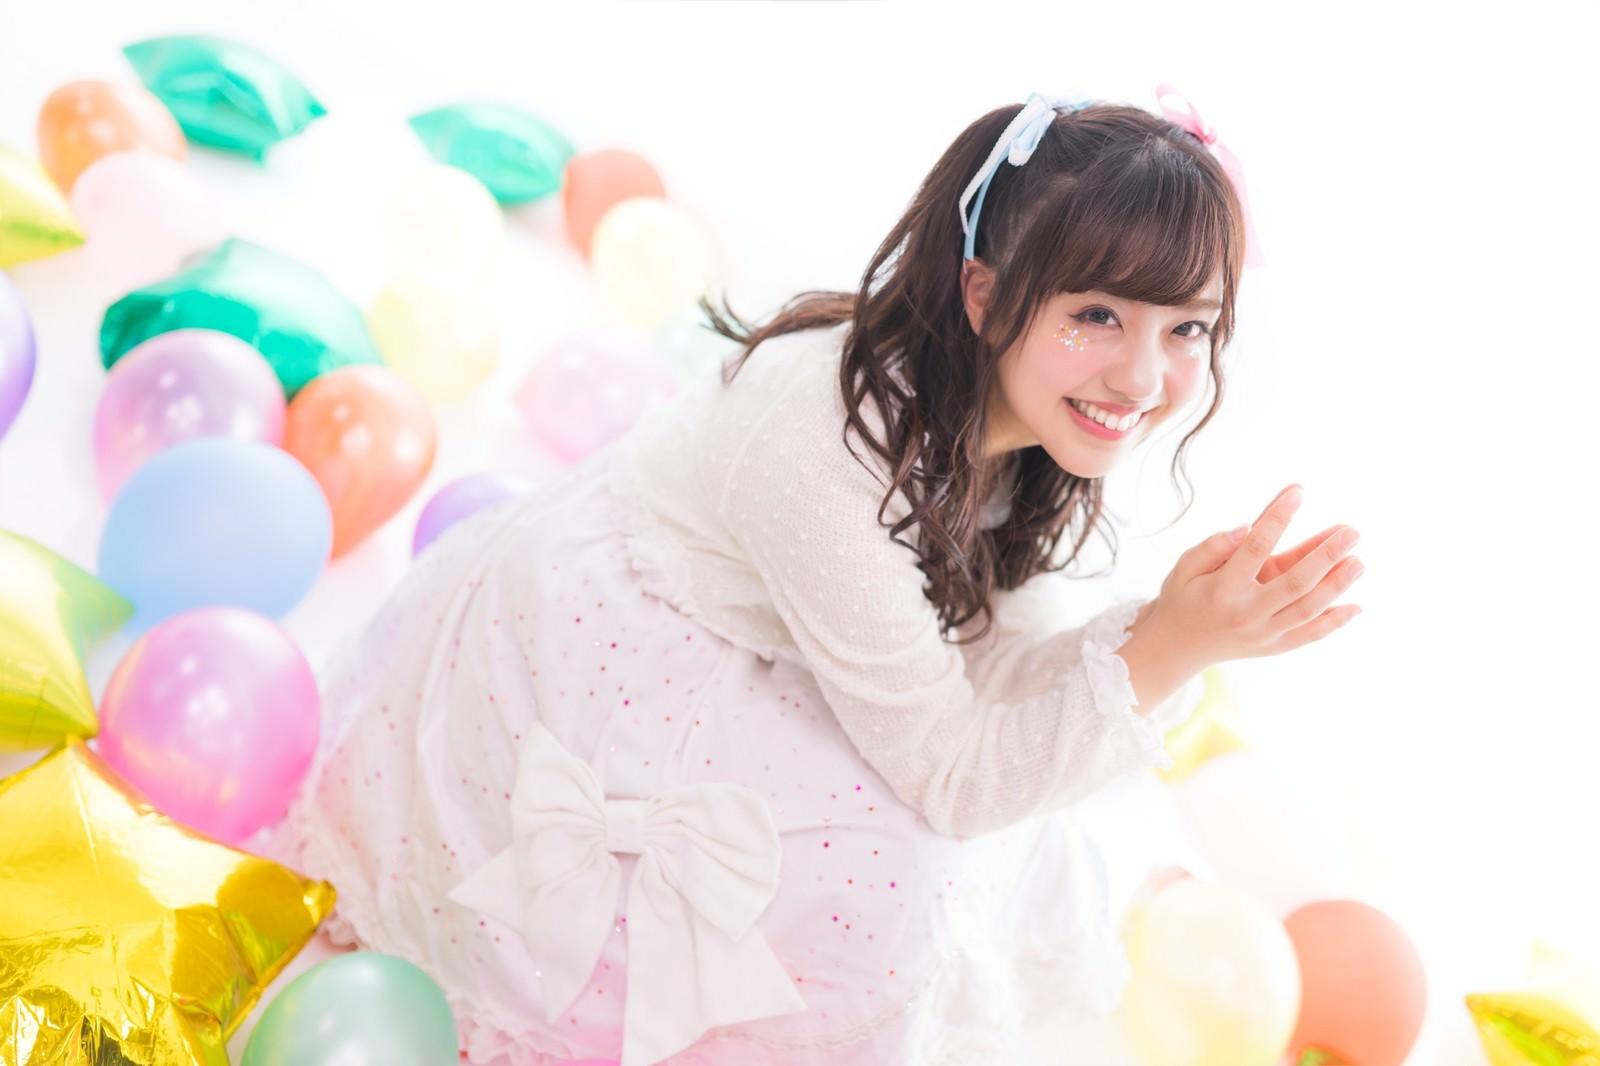 Yuka Kawamura Free Stock Photo Idol 04